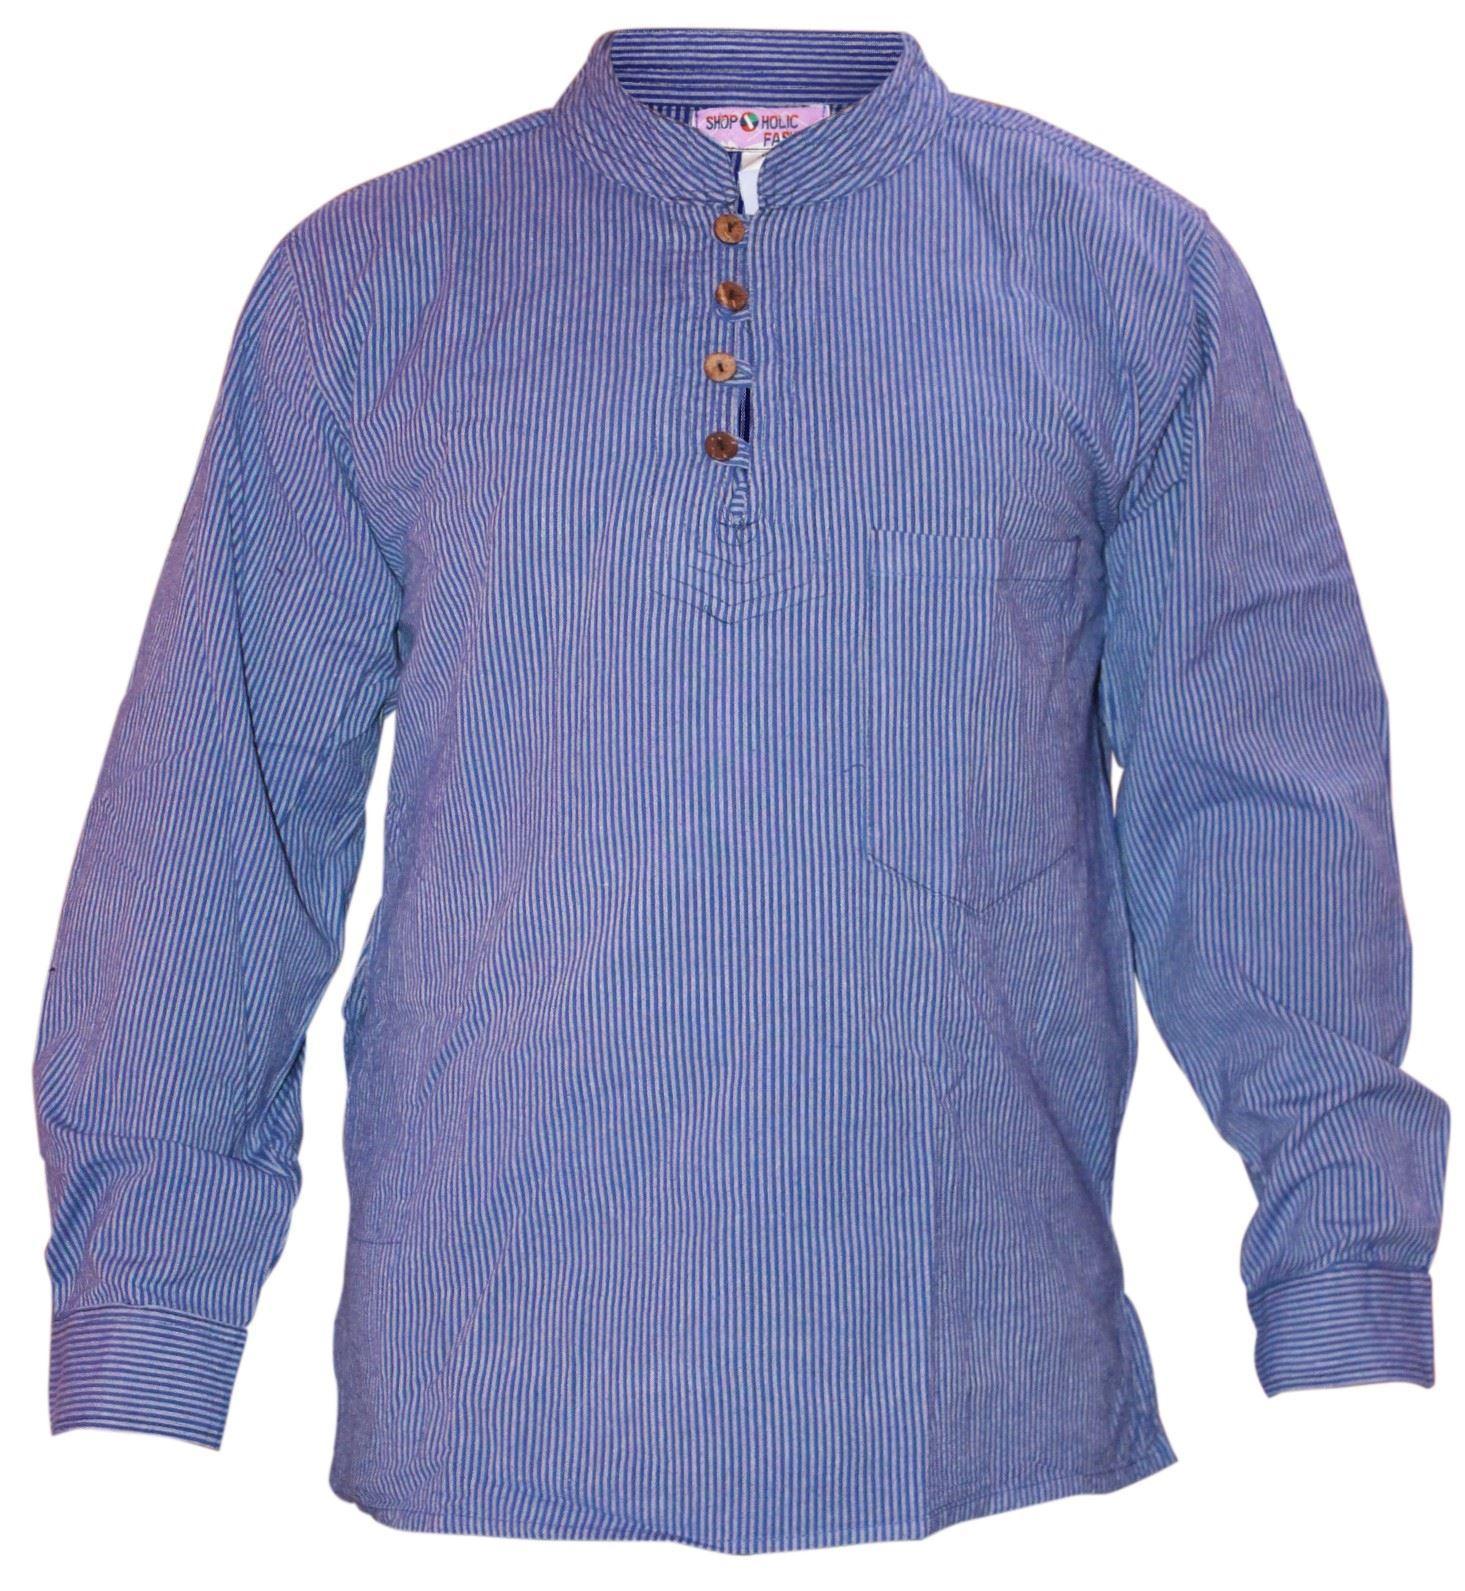 Shopoholic-Fashion-Mens-Summer-Stripy-Shirt-Full-Sleeve-Hippie-Tops thumbnail 6